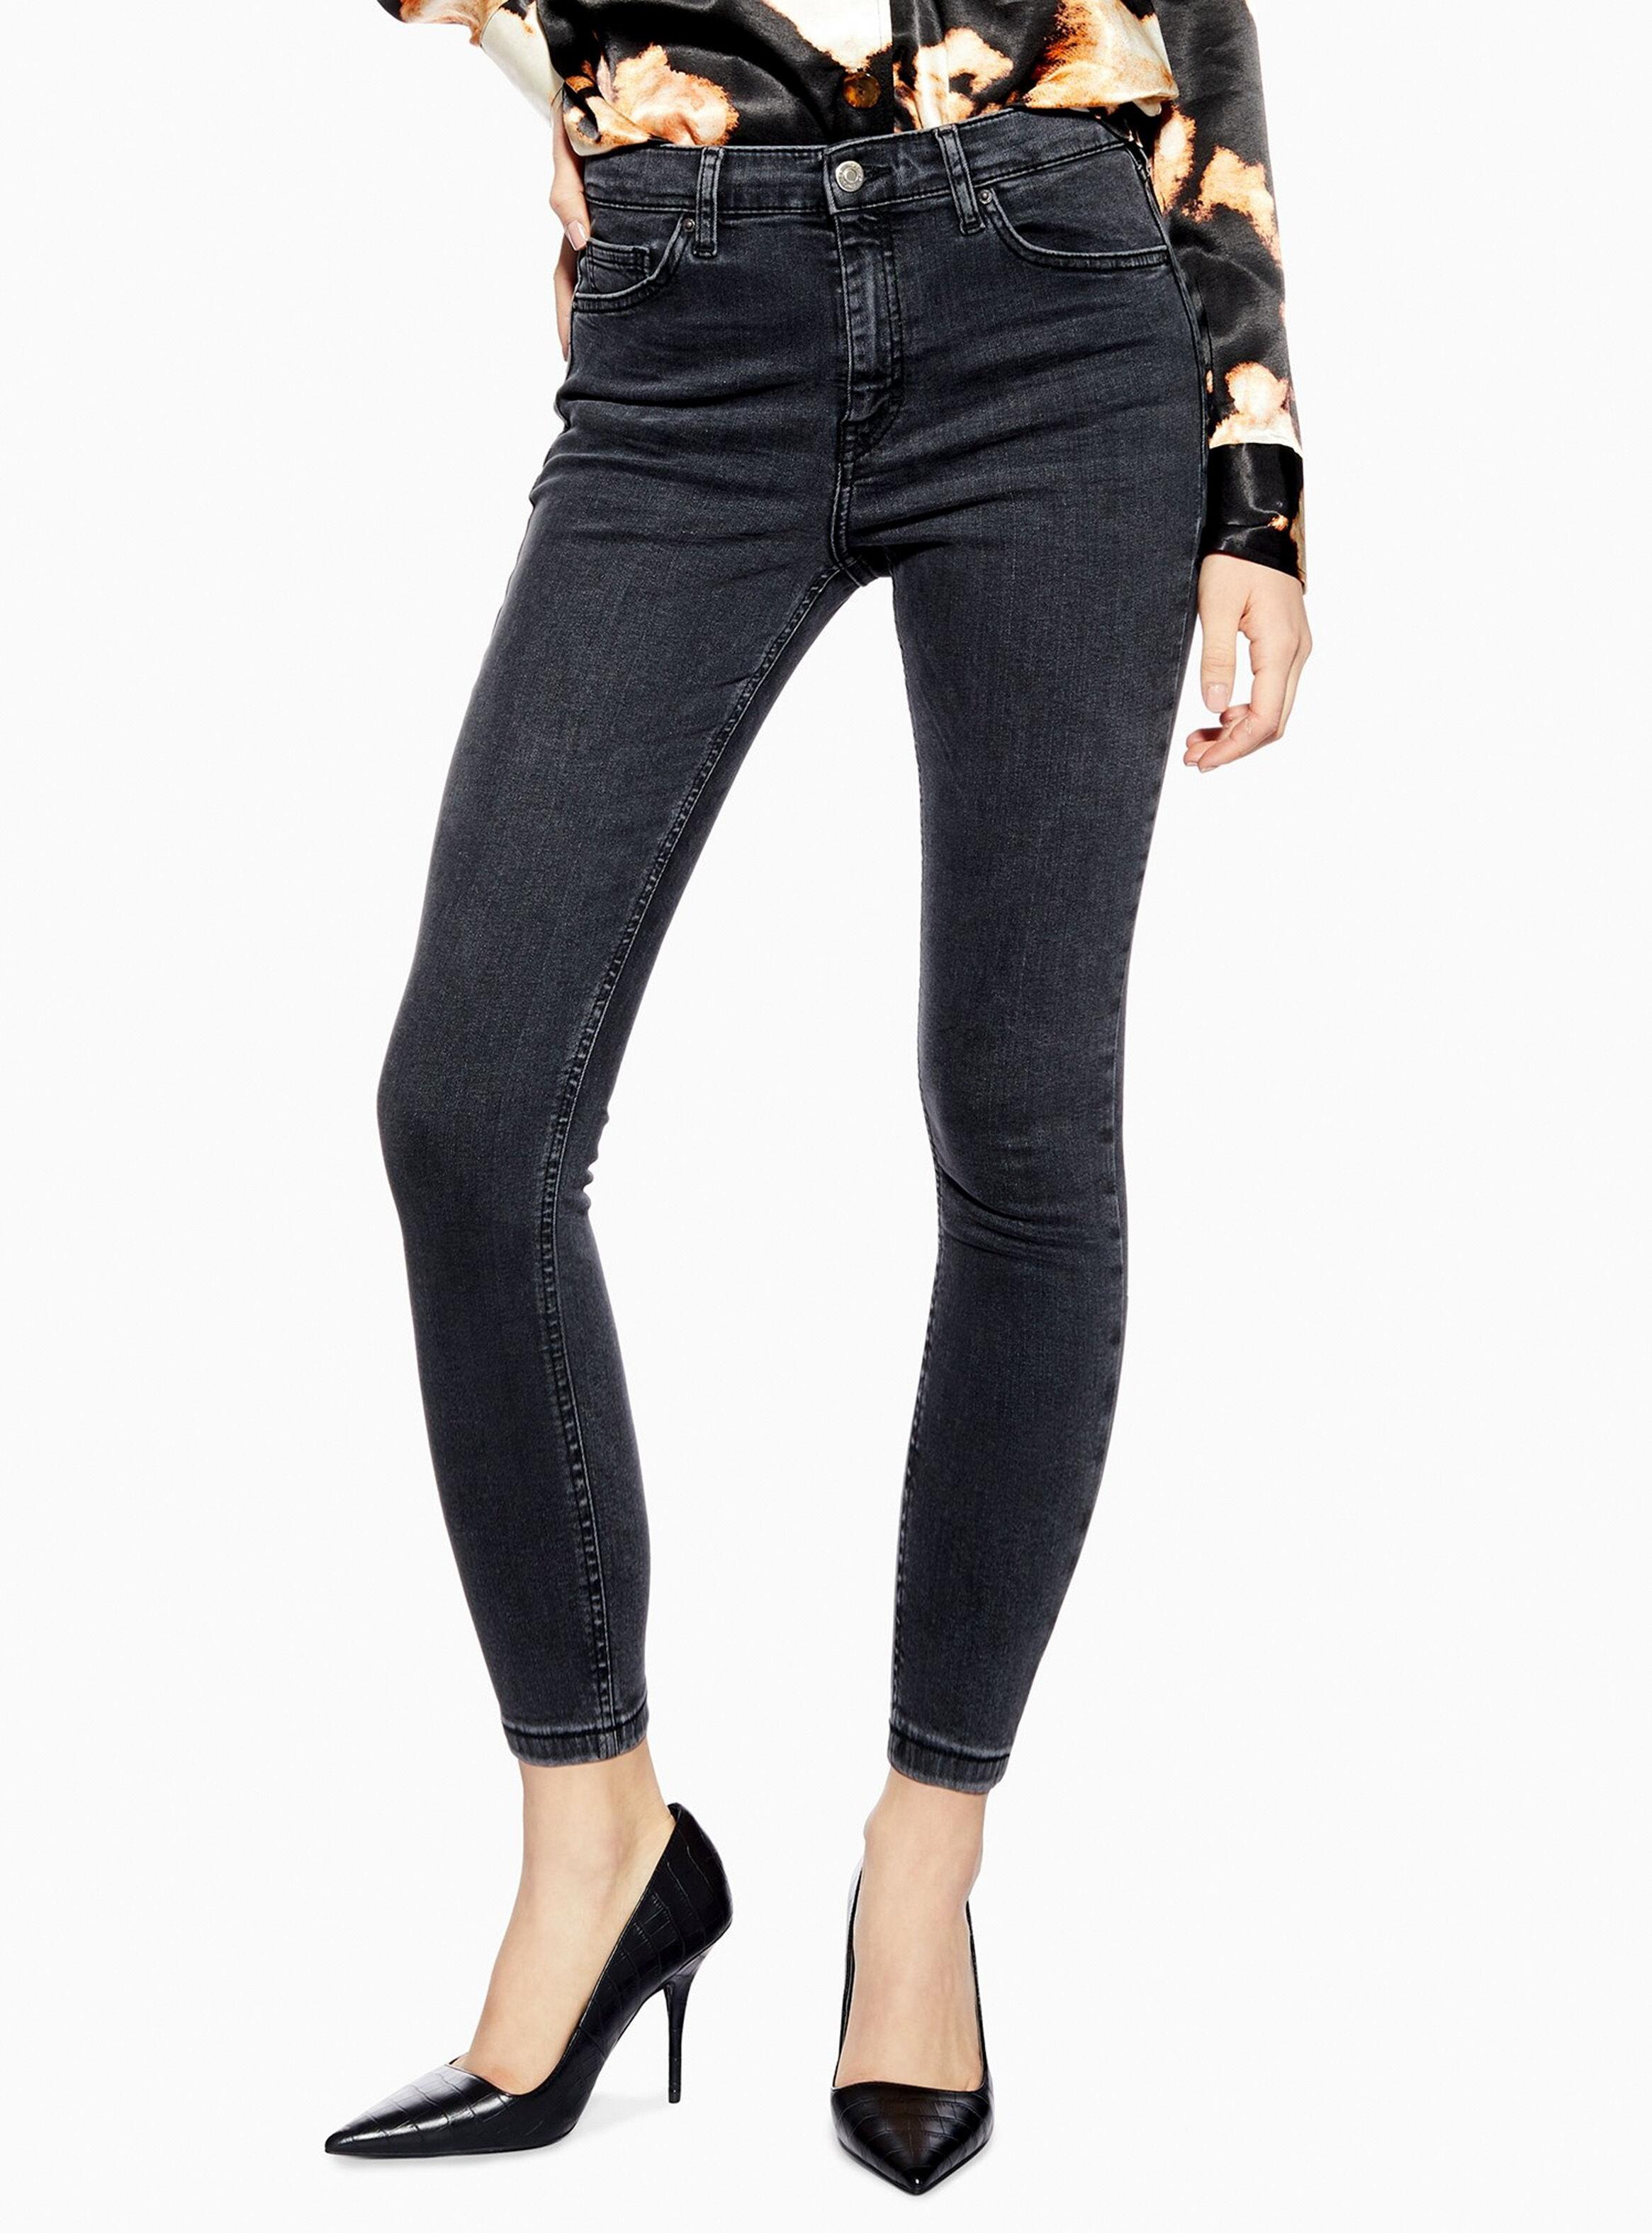 Jeans Jamie Washed Black Largo 30 Topshop